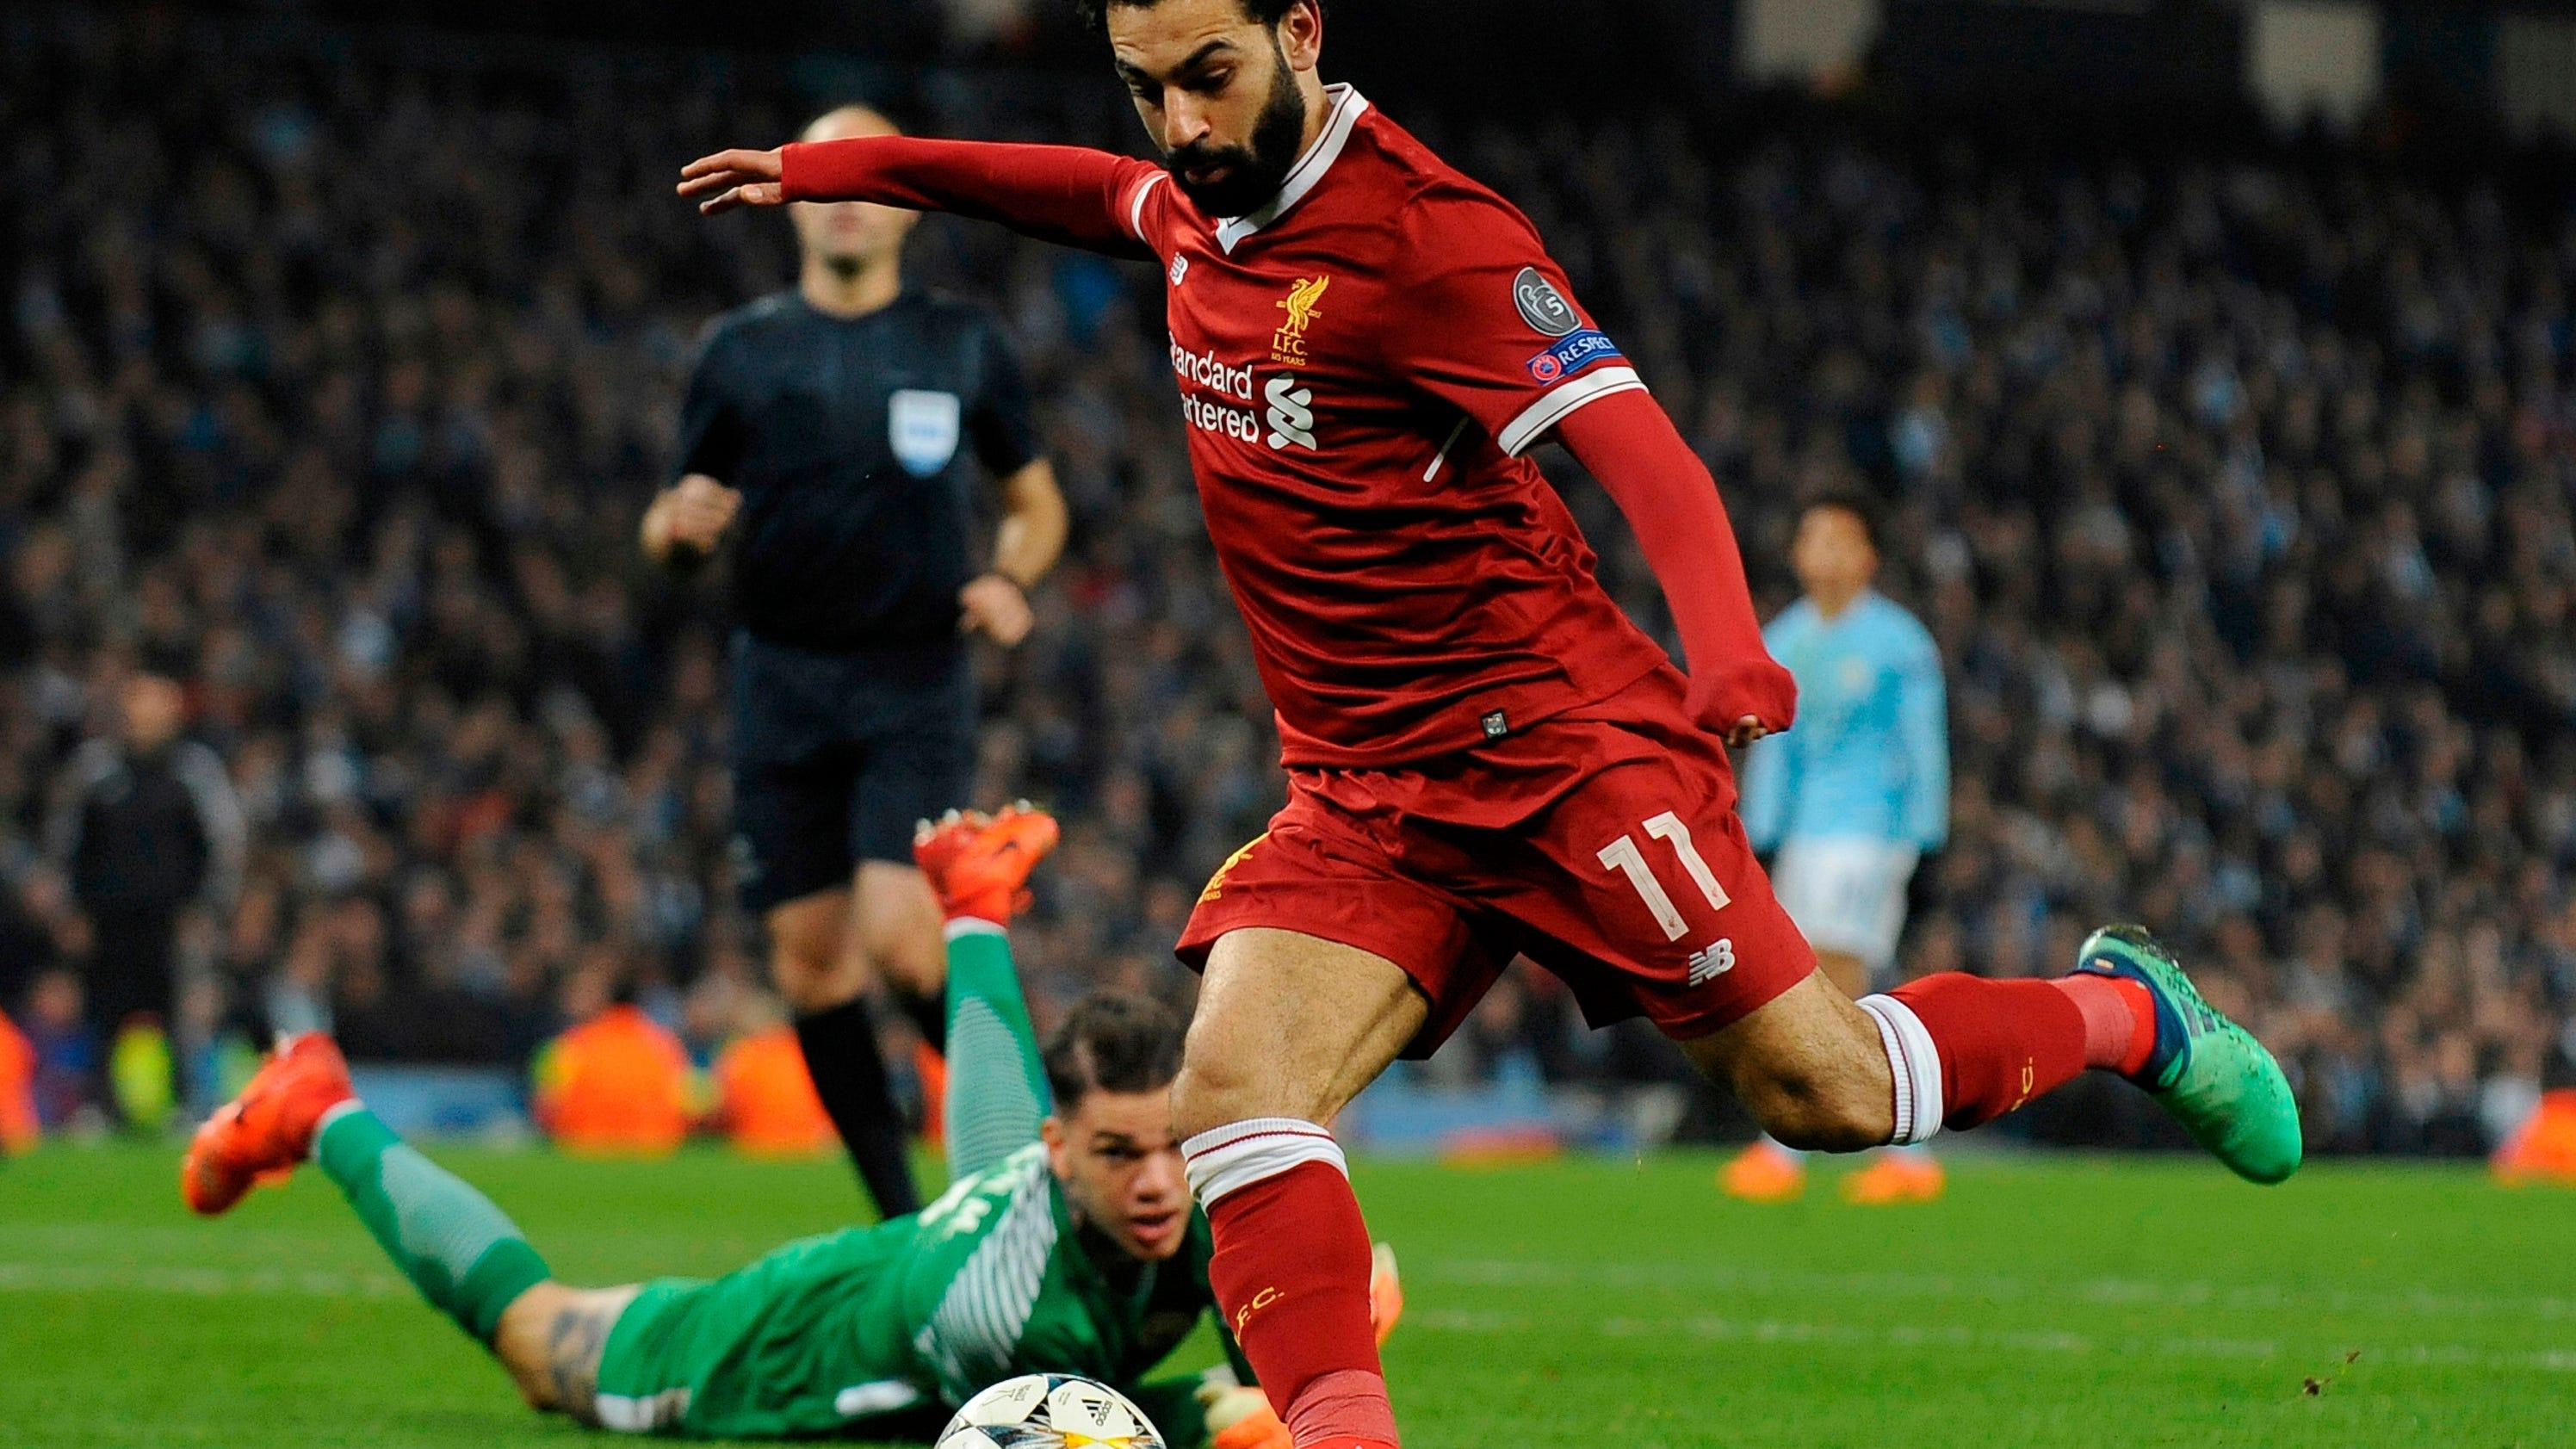 Commercial dispute showcases Salah's star power in Egypt